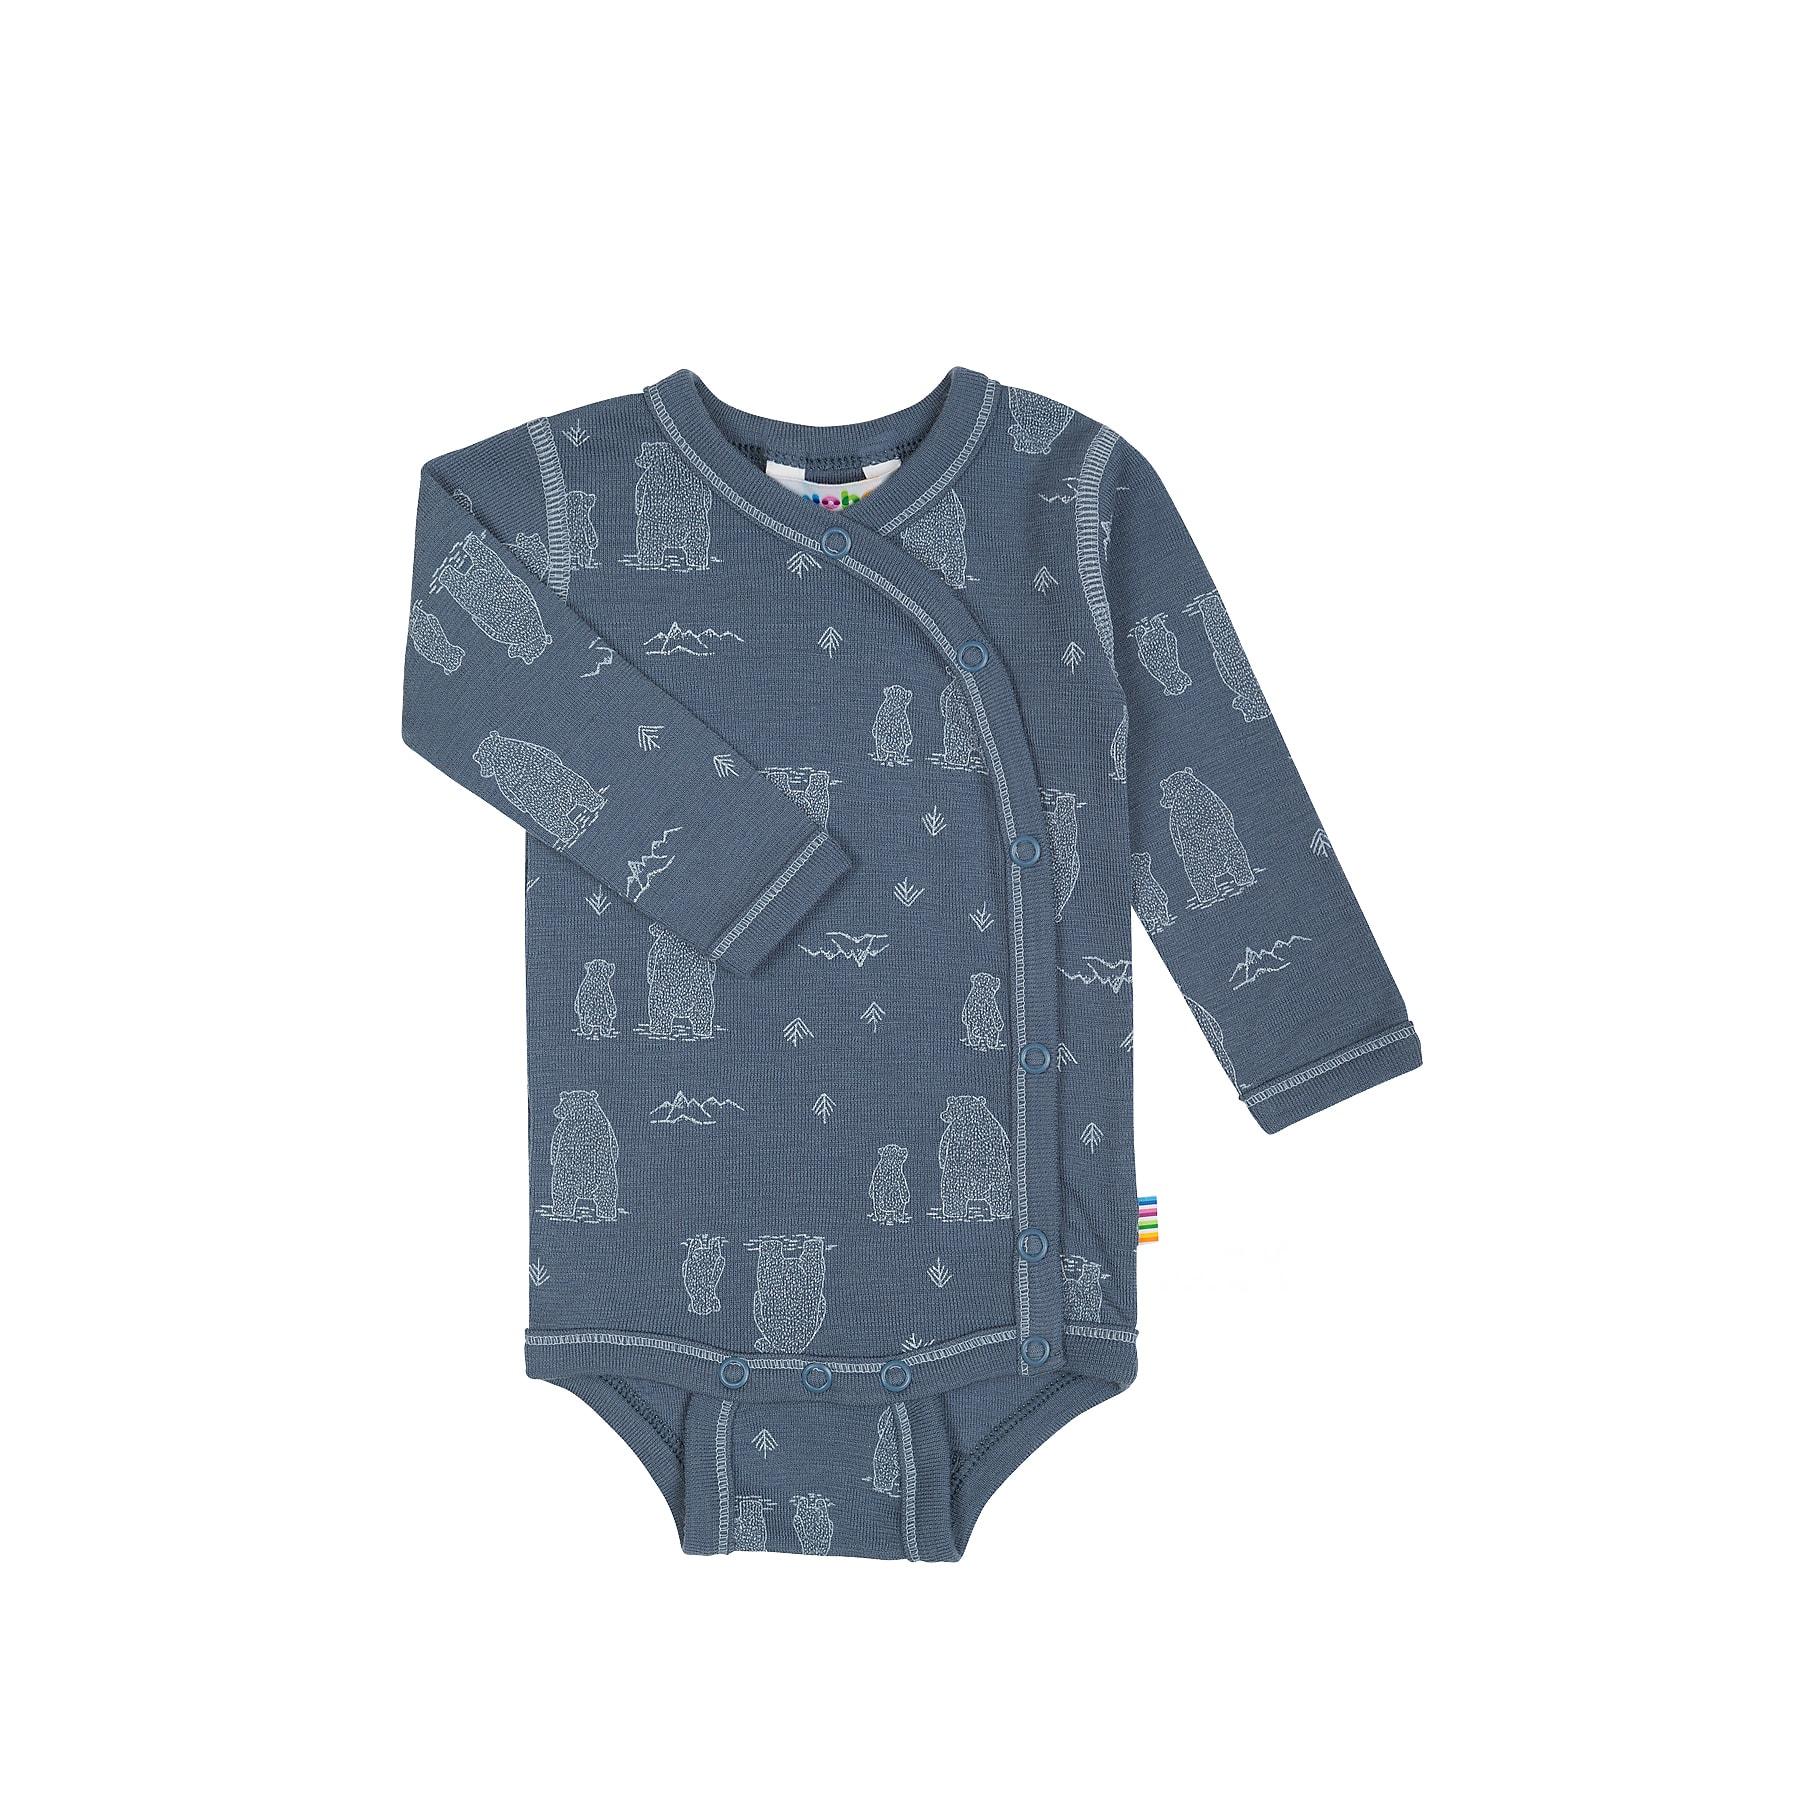 e9a511c29f1 Body til for tidligt født - Lange ærmer og slå om - Blå uld med print